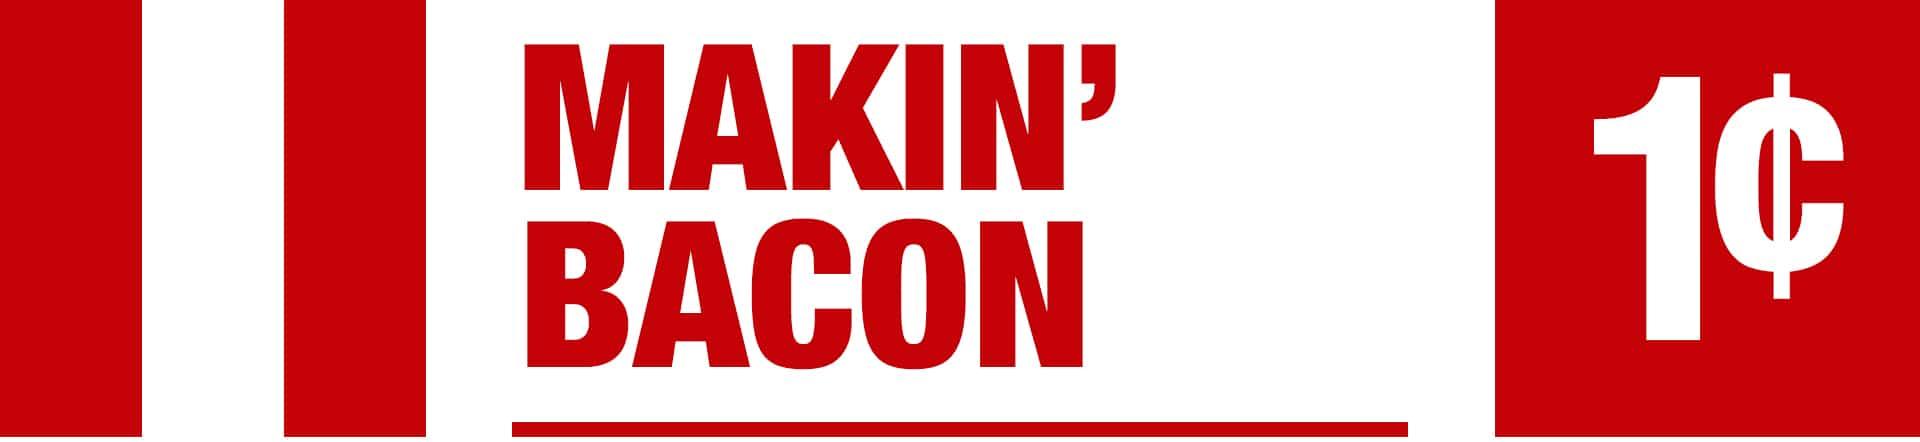 Makin' Bacon - Penny Jackpot